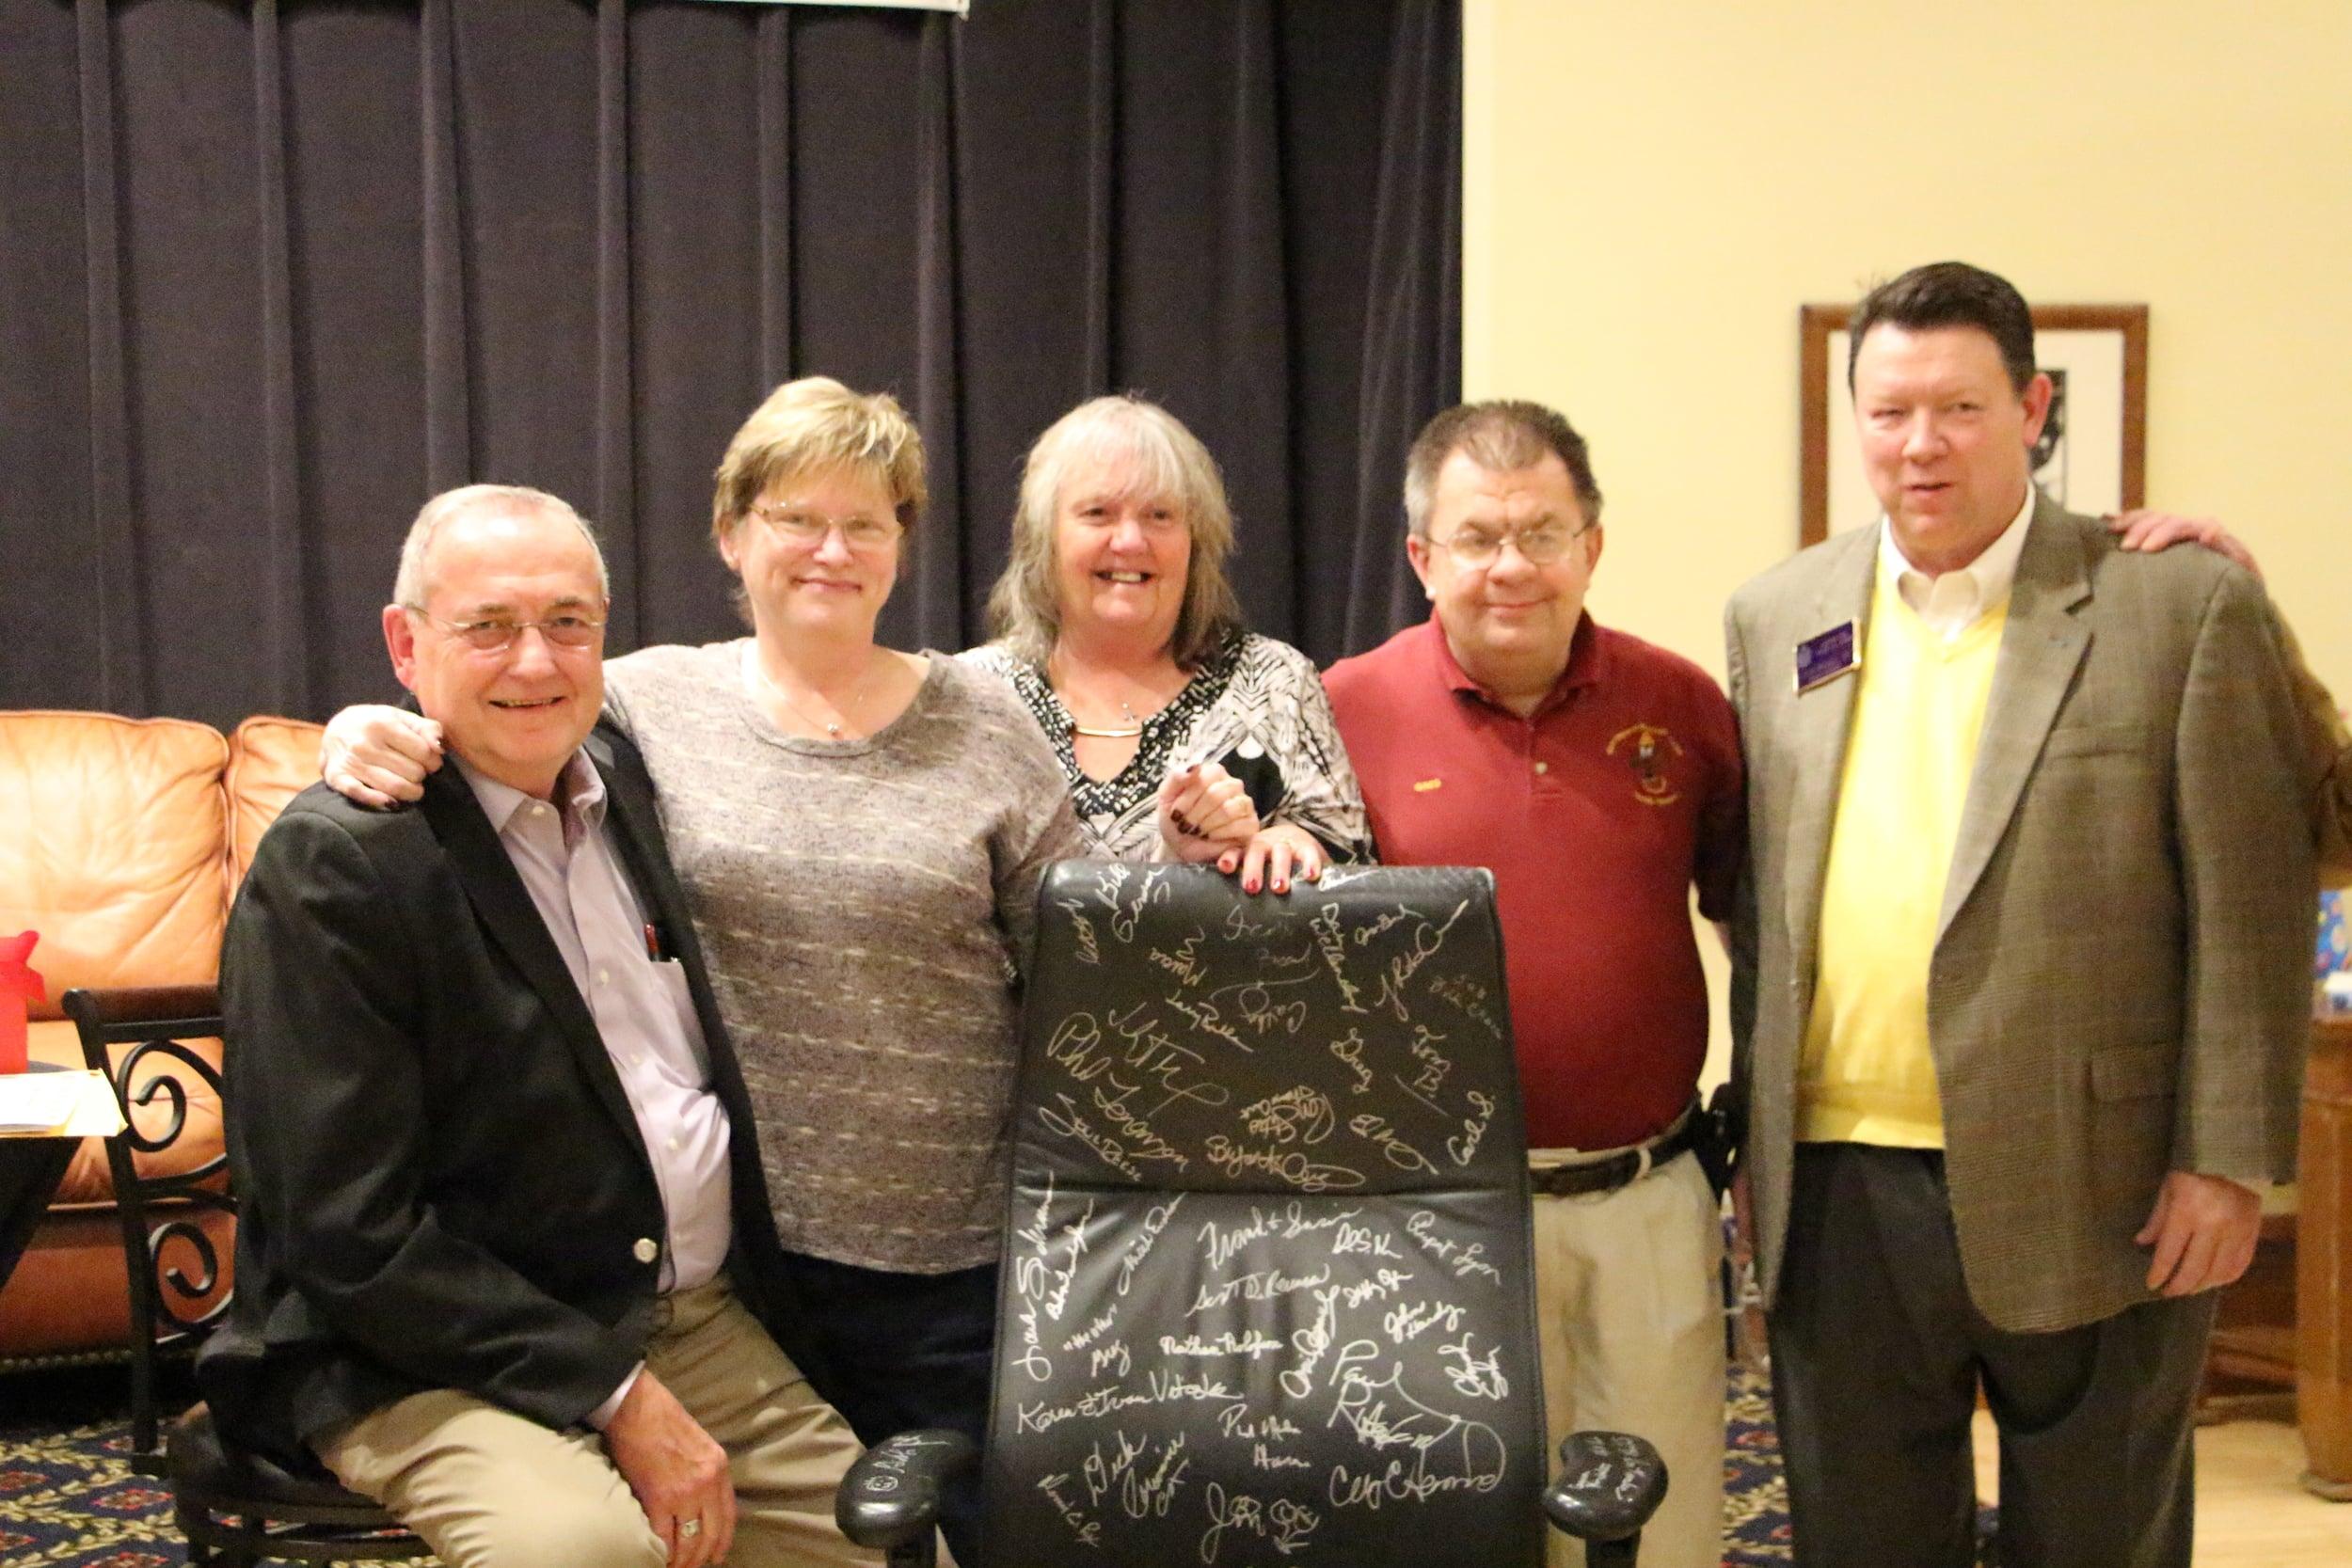 Curt, Cathy, Marcia, Greg, and John